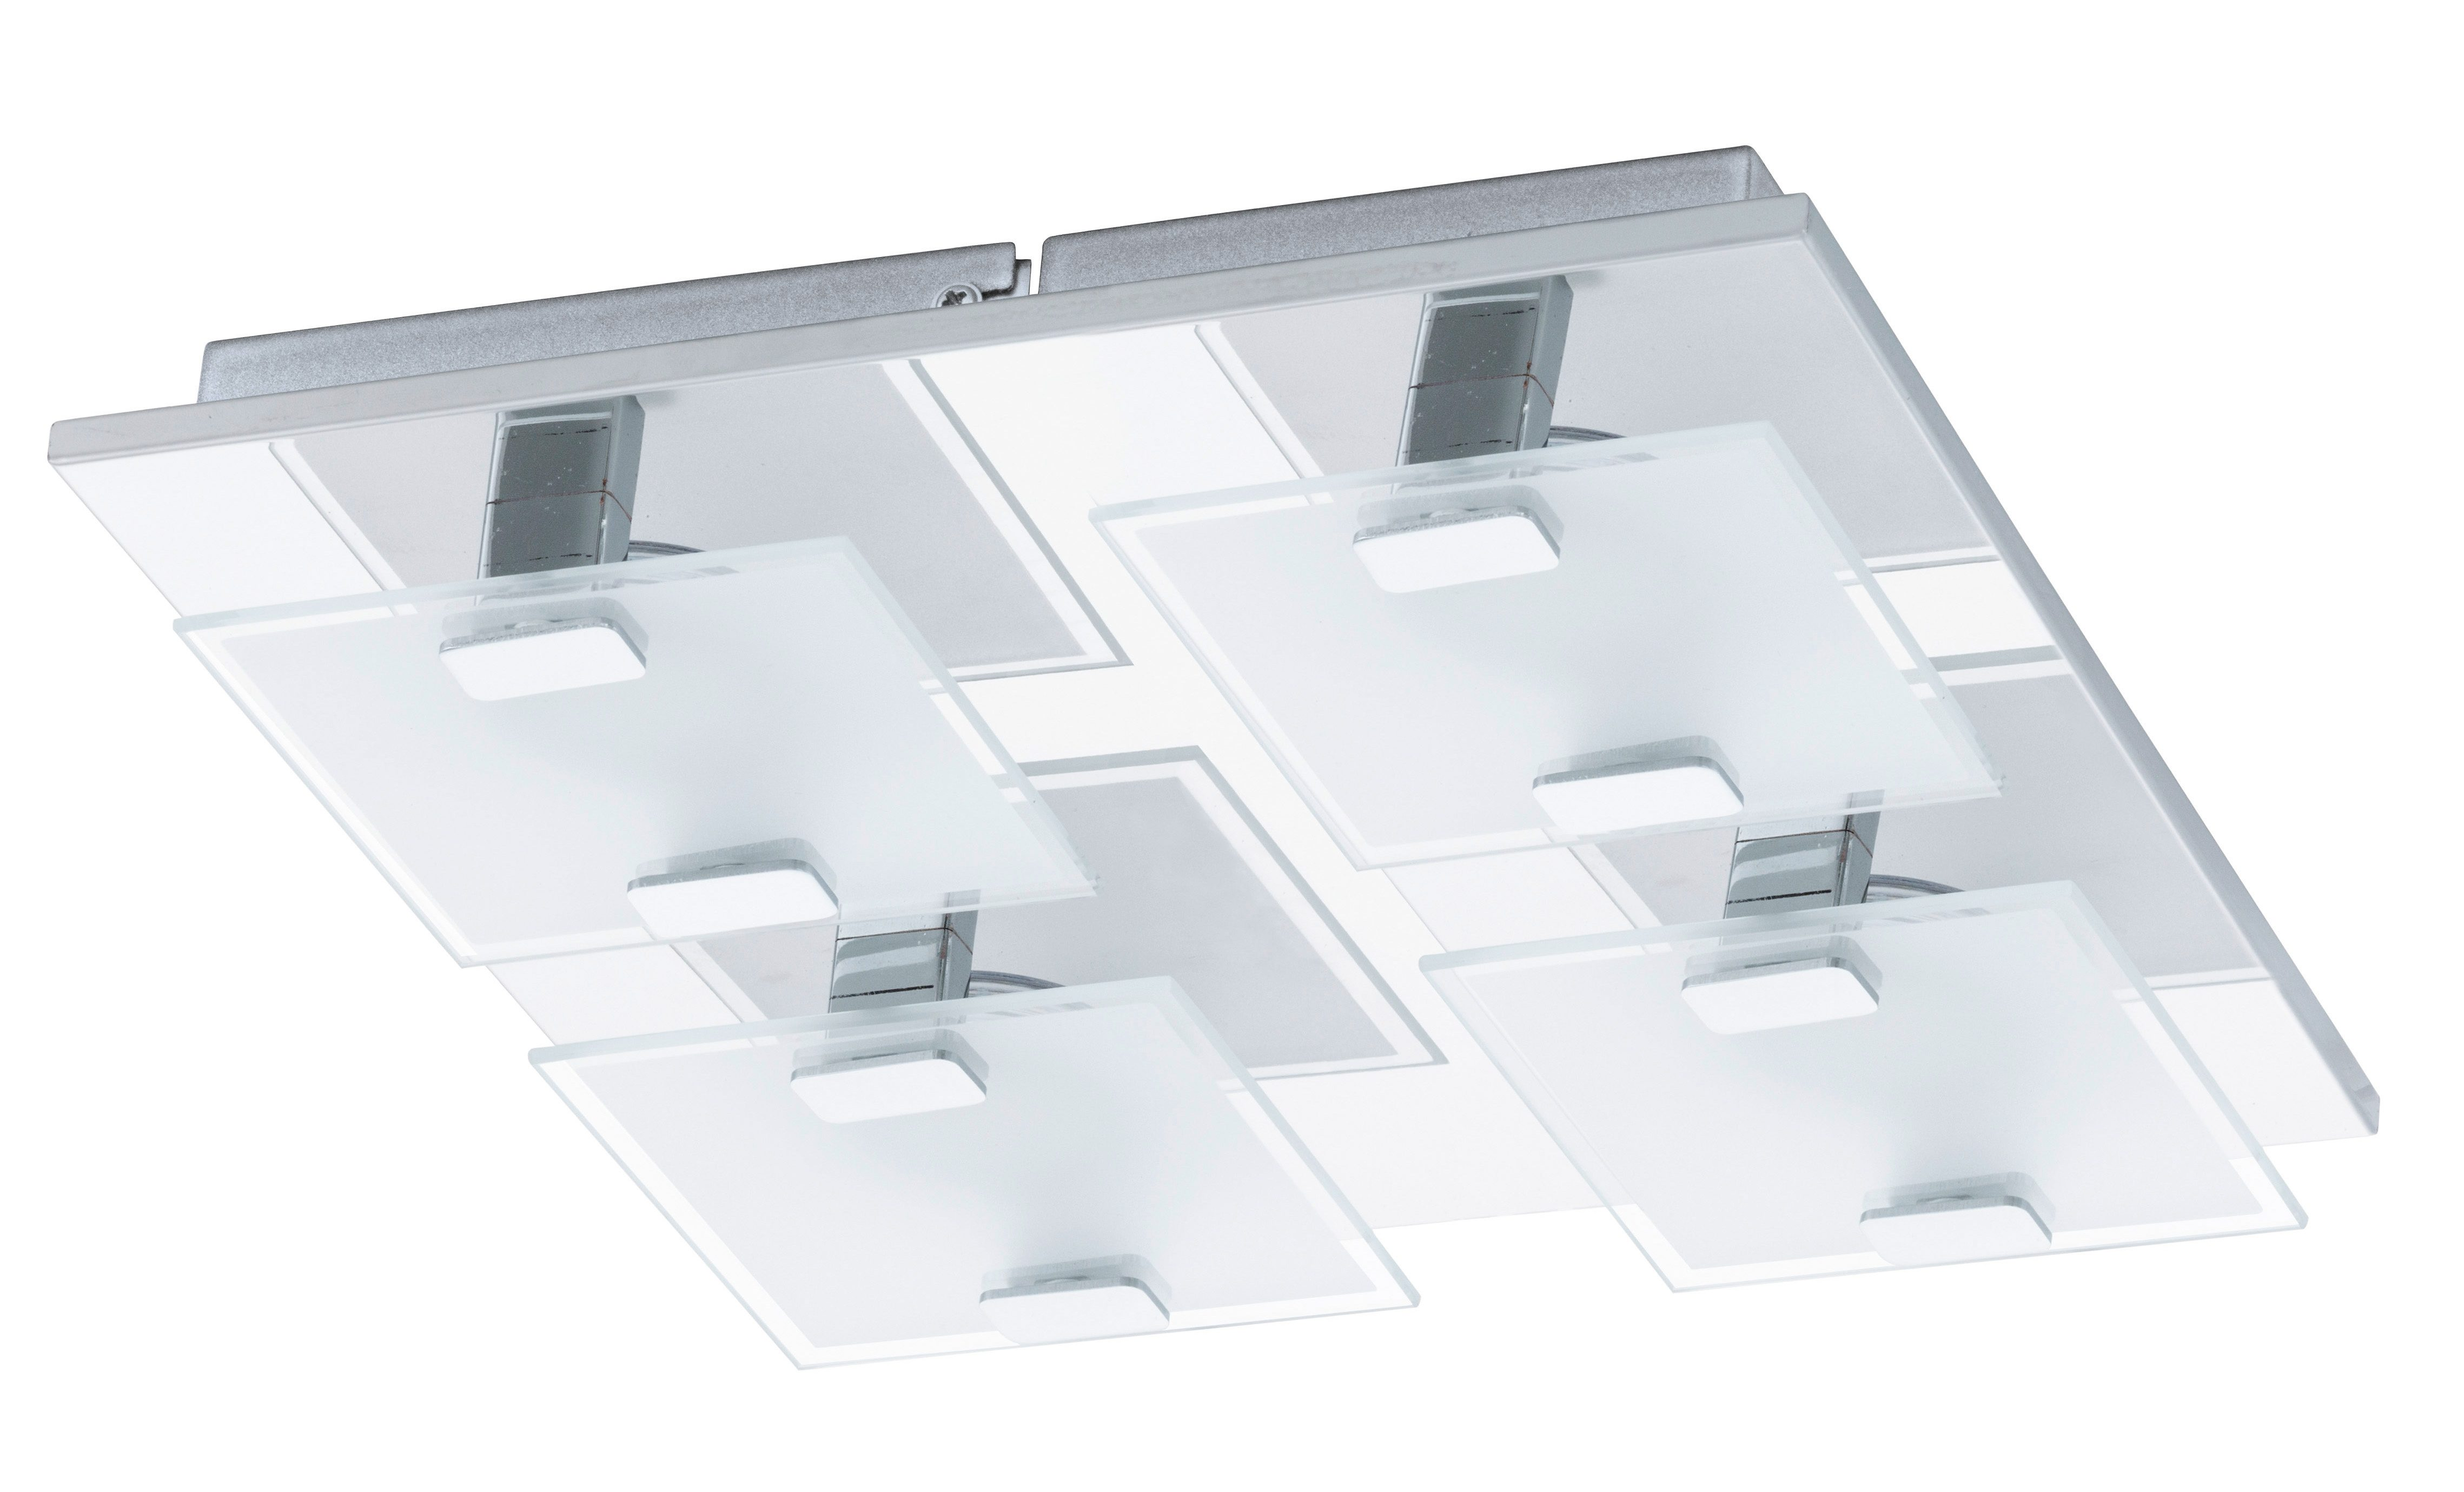 EGLO,LED Deckenleuchte VICARO